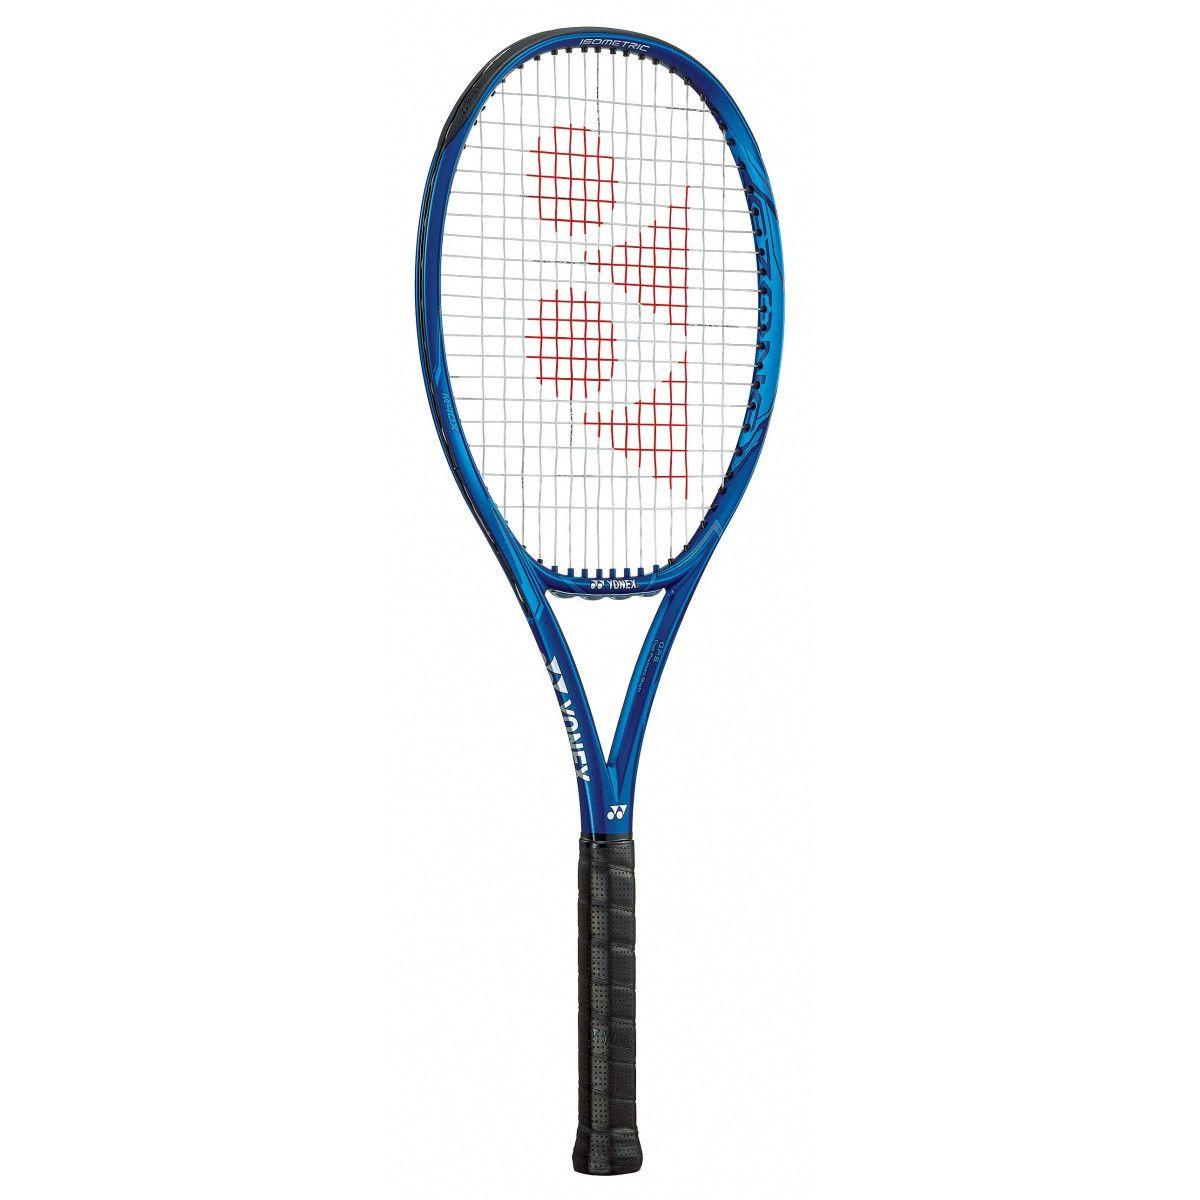 Raquete de Tenis Yonex Ezone 100 - 2020